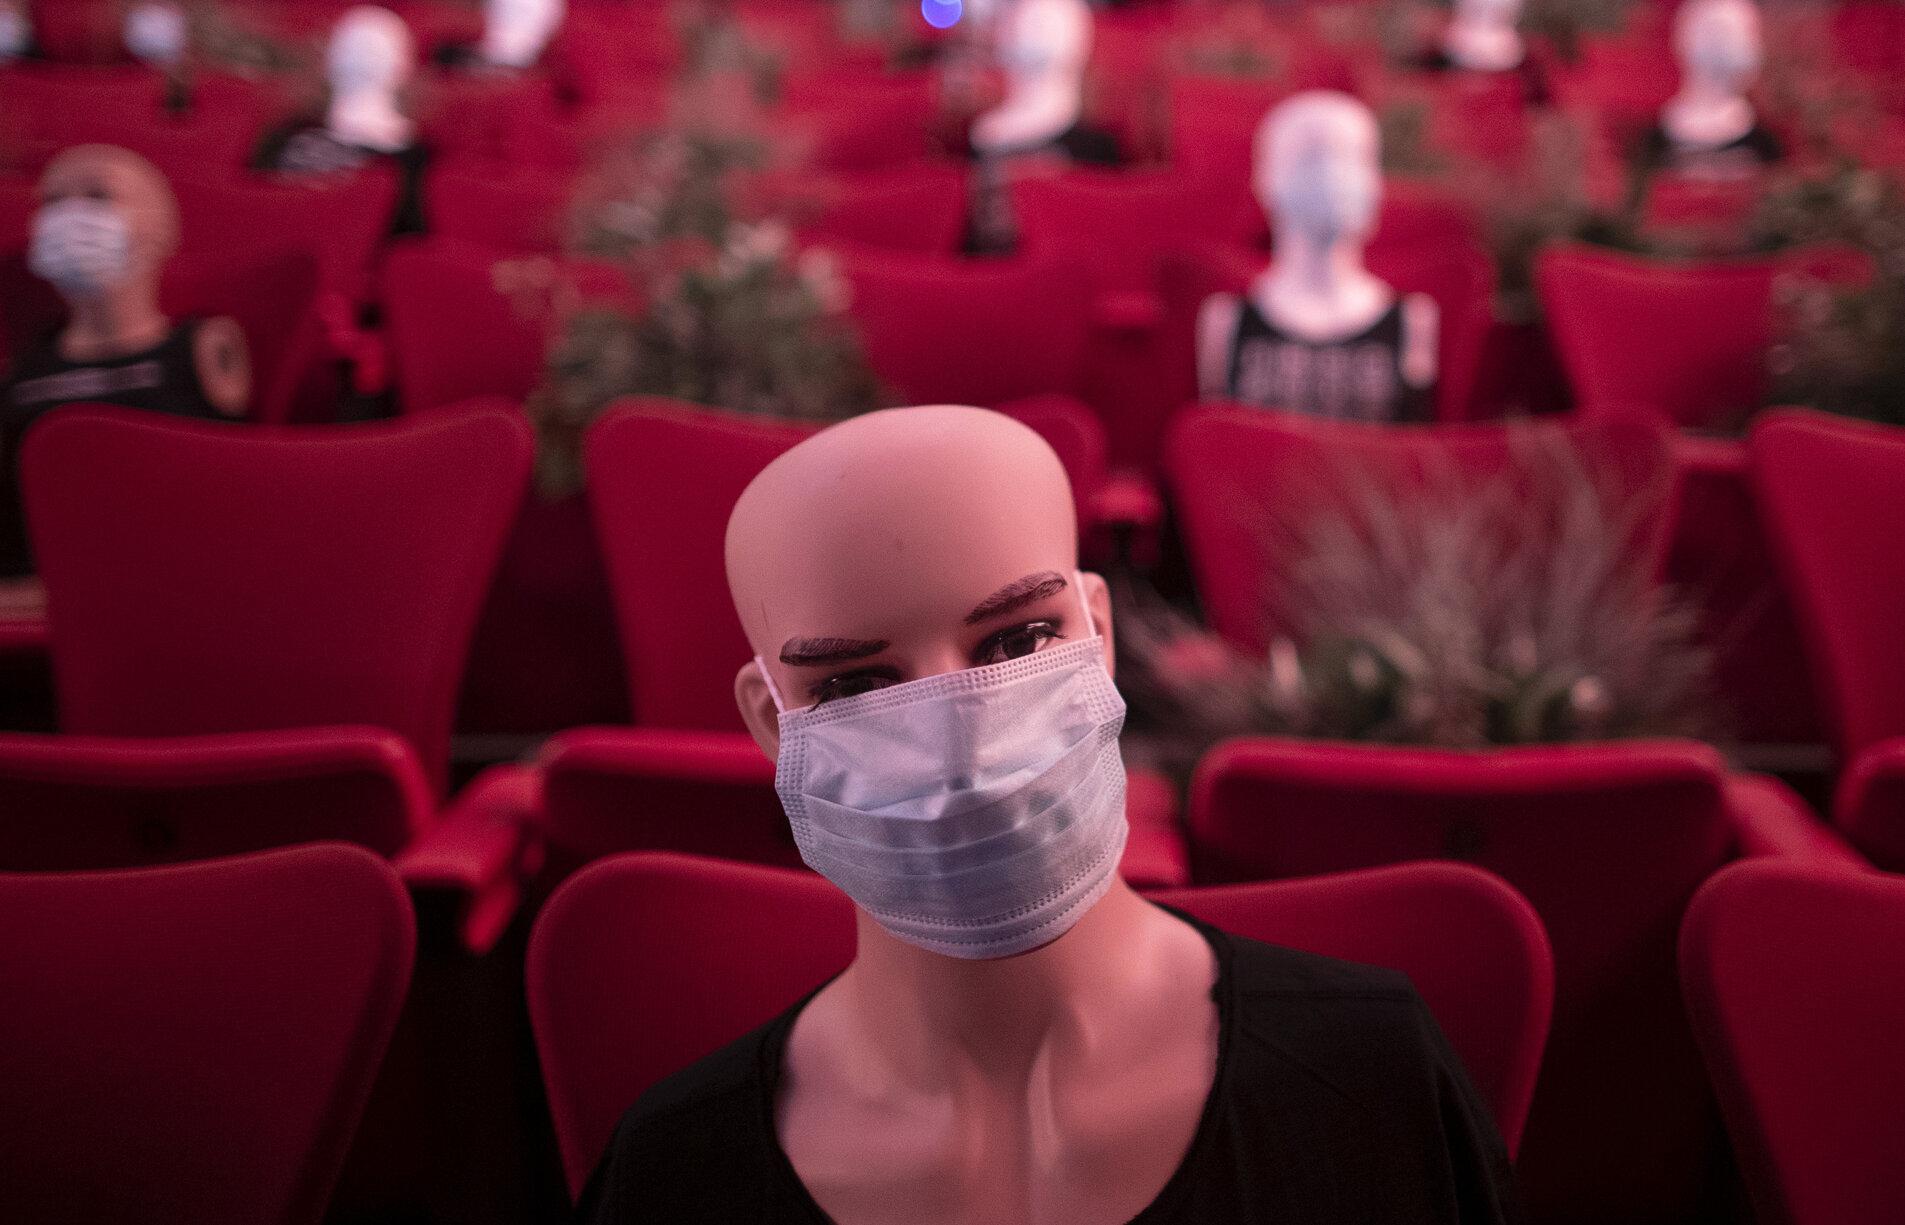 Editorial Marius Tucă. Pandemie de închis teatre